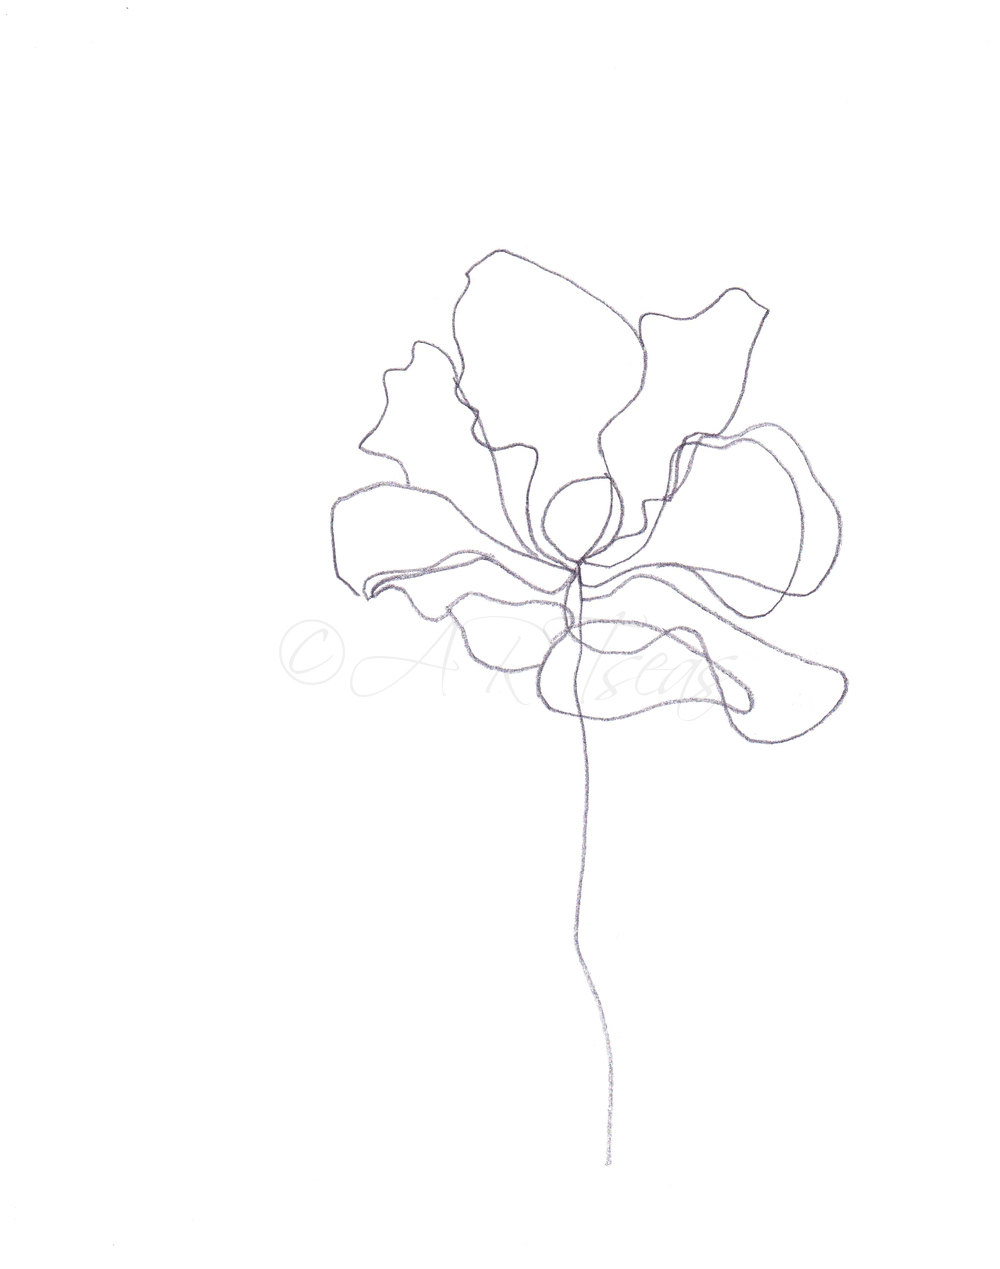 1000x1269 Abstract Minimalist Botanical Pencil Drawing Archival Art Print